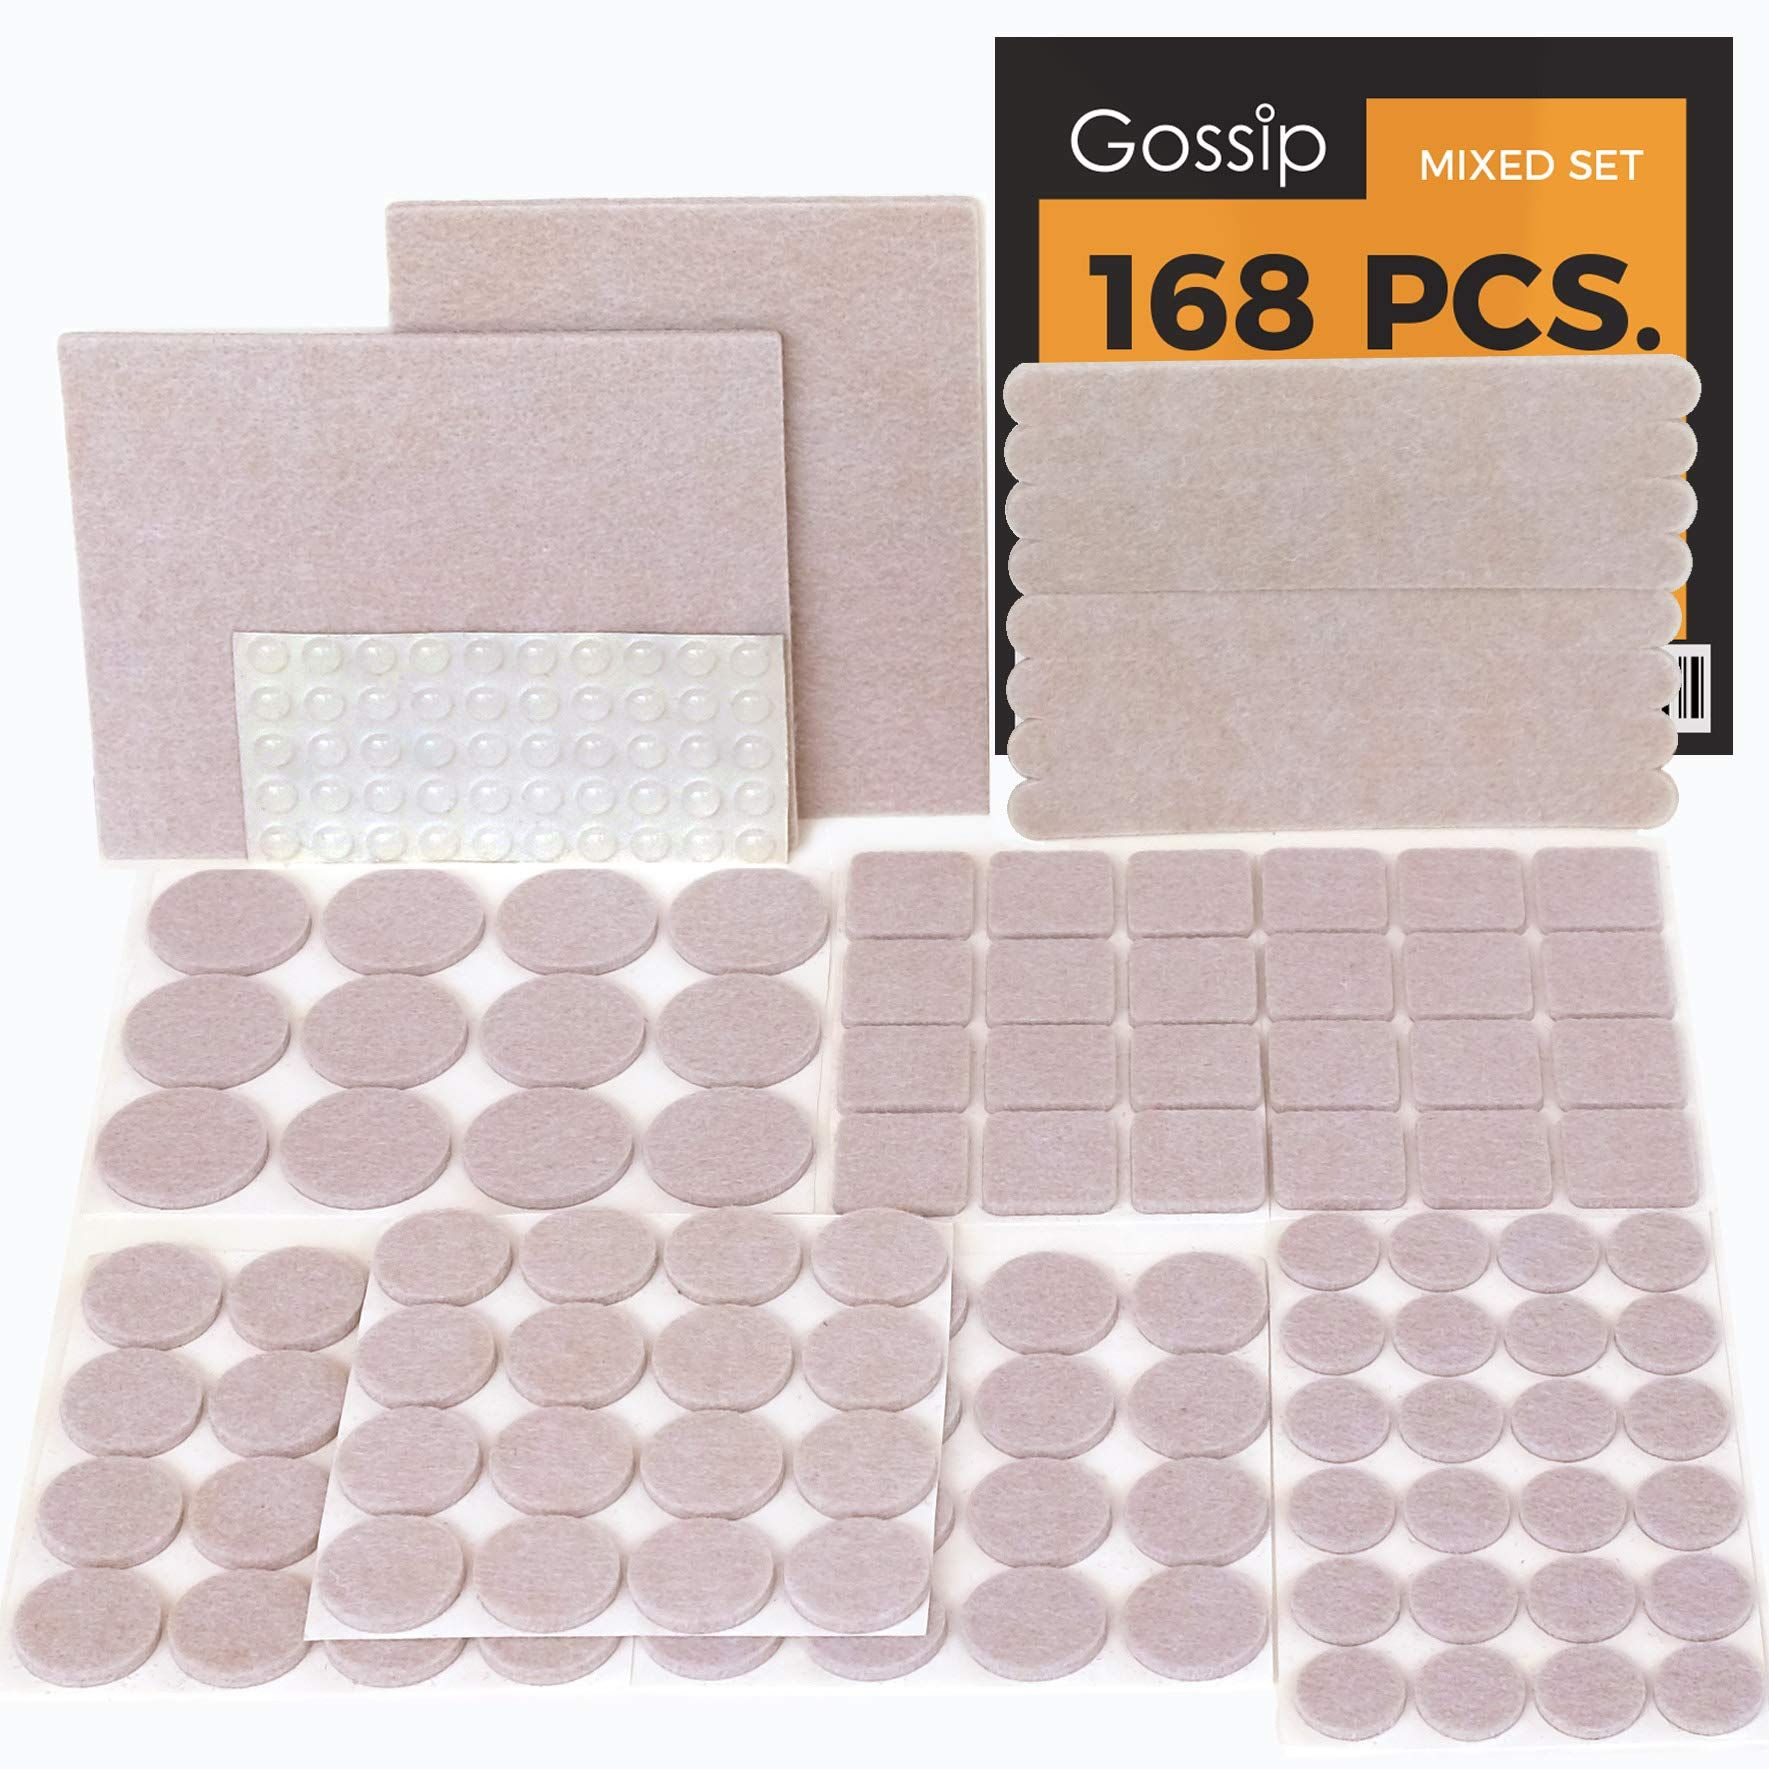 Gossip Felt Furniture Pads Beige Set 168 Pcs Value Pack Heavy Duty Adhesive Felt Pads For Furniture Feet T With Images Furniture Pads Felt Furniture Pads Furniture Feet